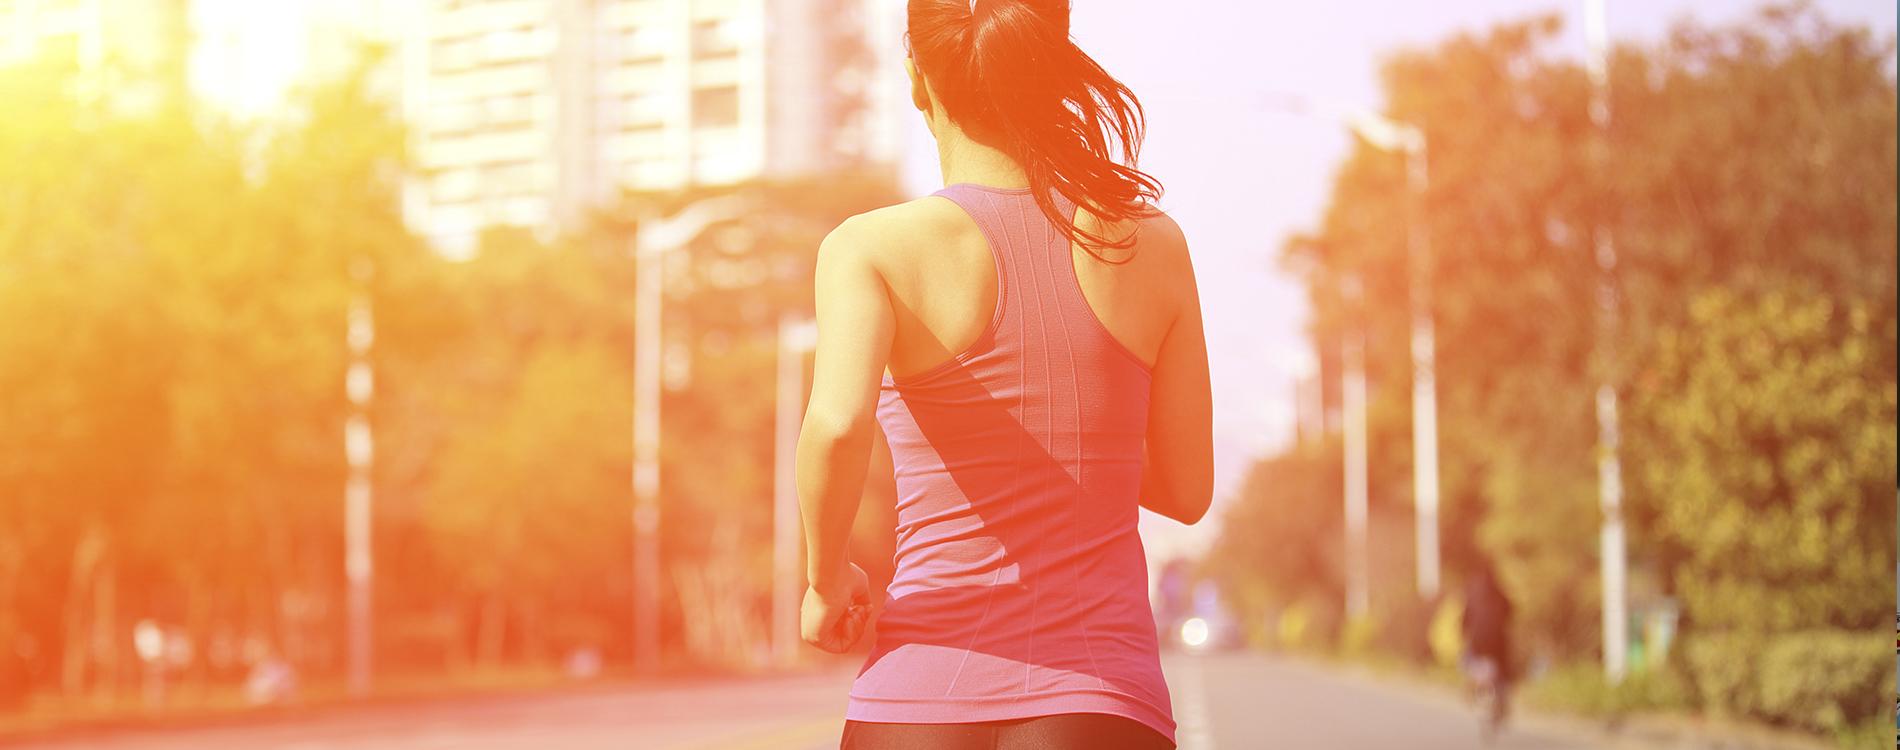 5 Health Benefits of Hot/bikram Yoga